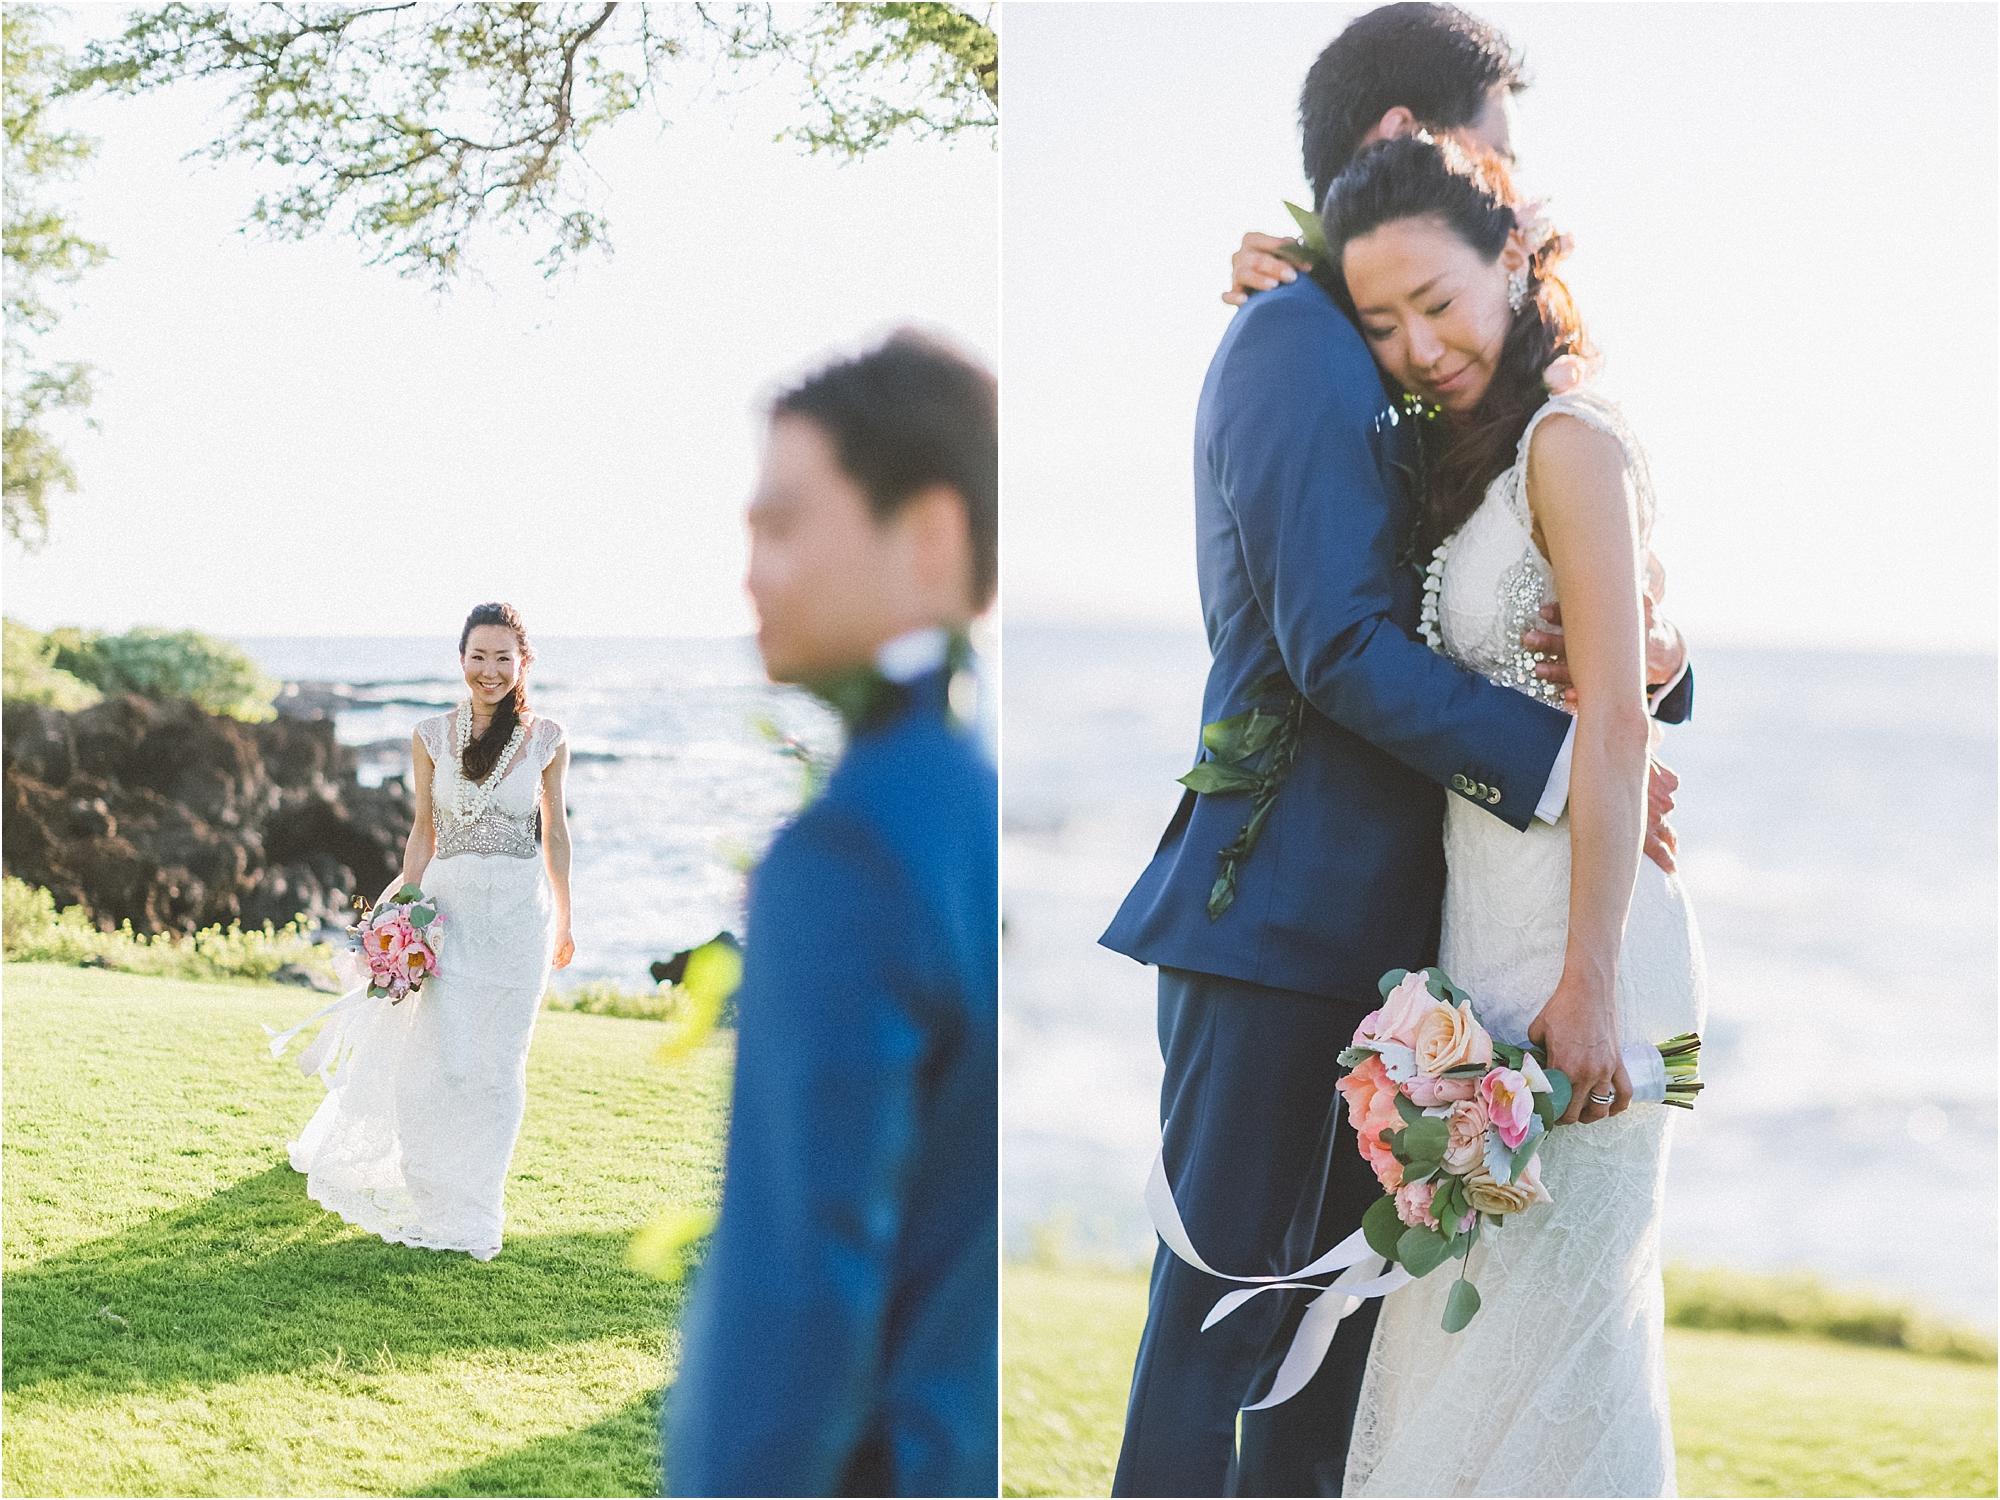 angie-diaz-photography-maui-hawaii-destination-wedding-makena-golf-beach-club_0044.jpg